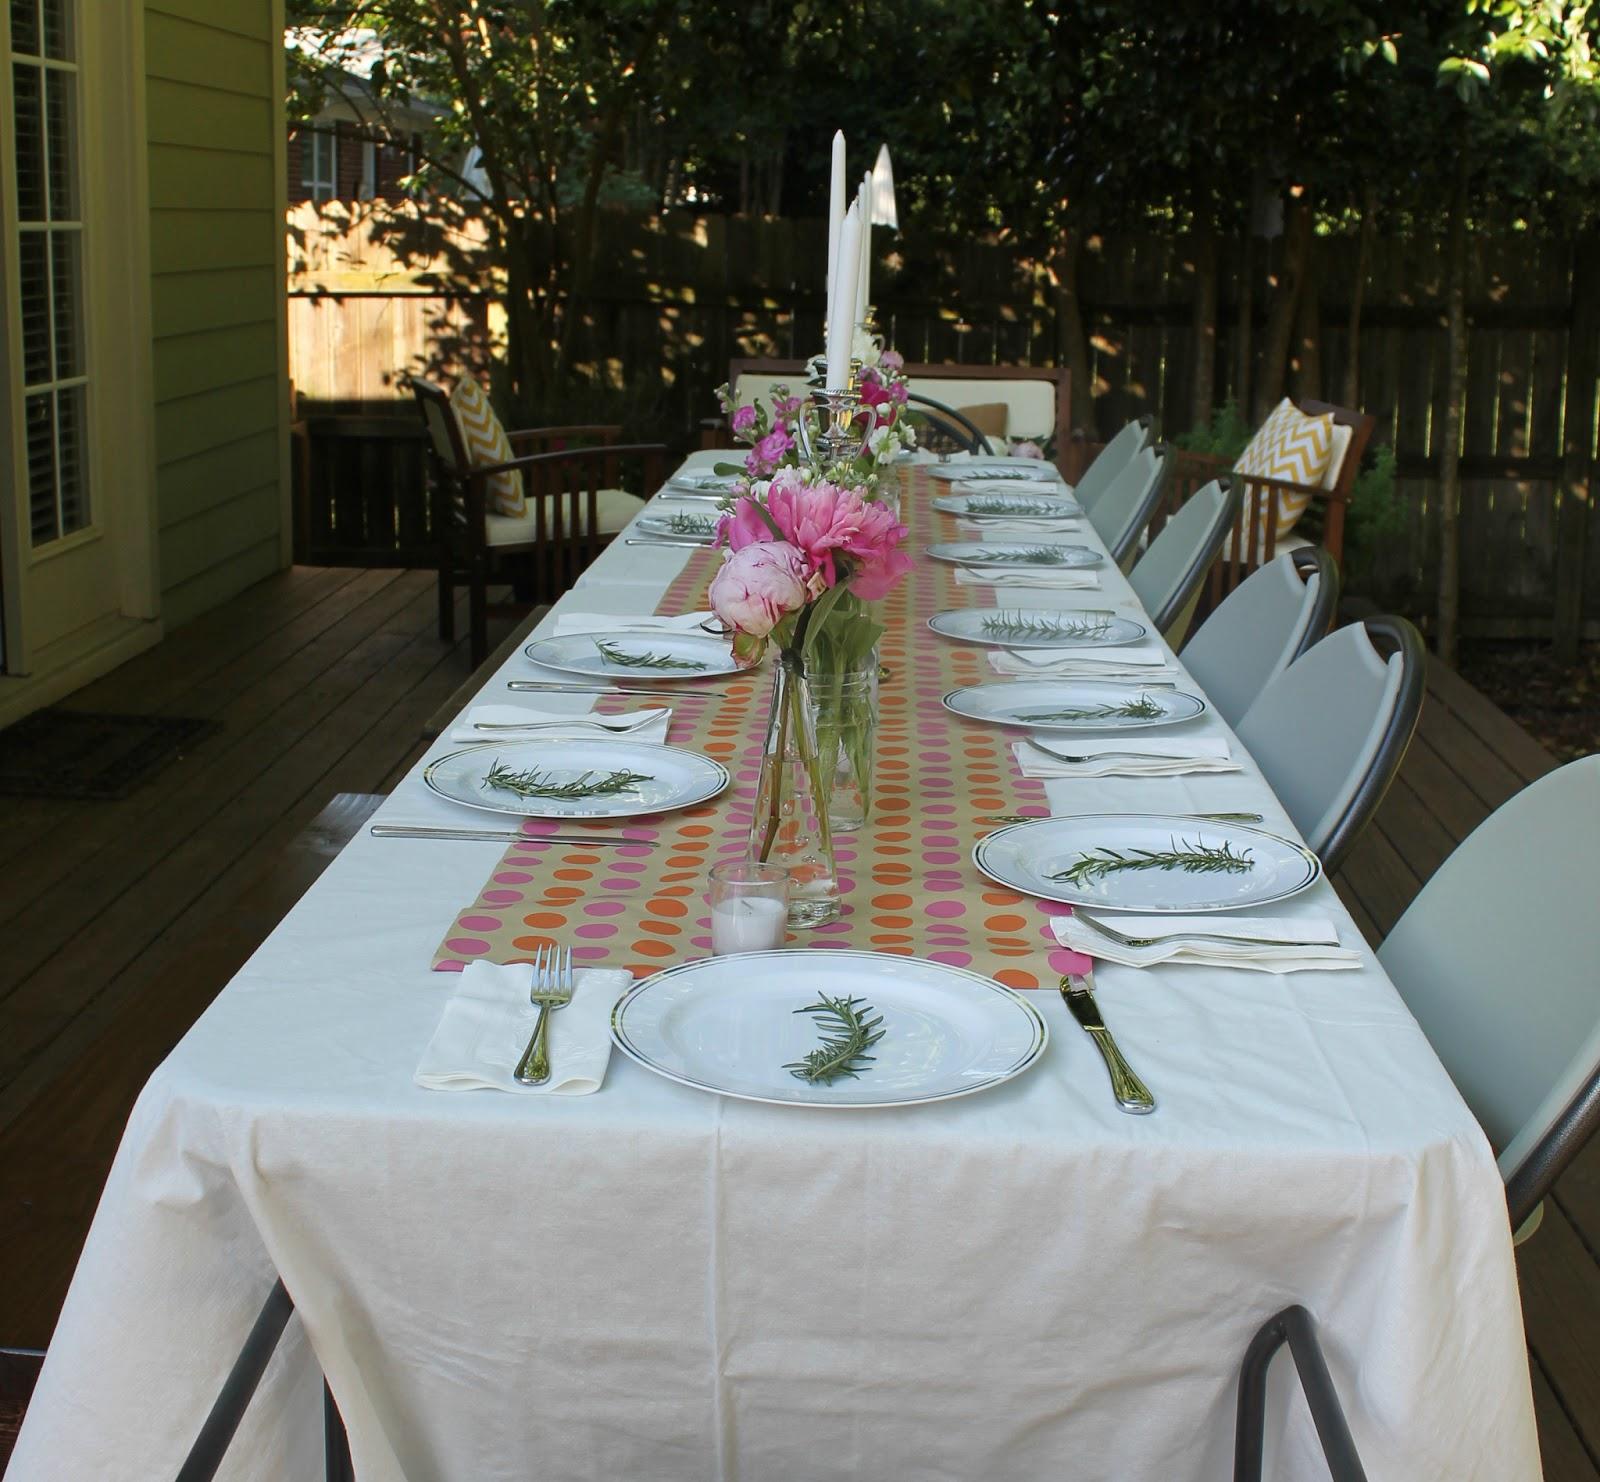 A Backyard Dinner Party